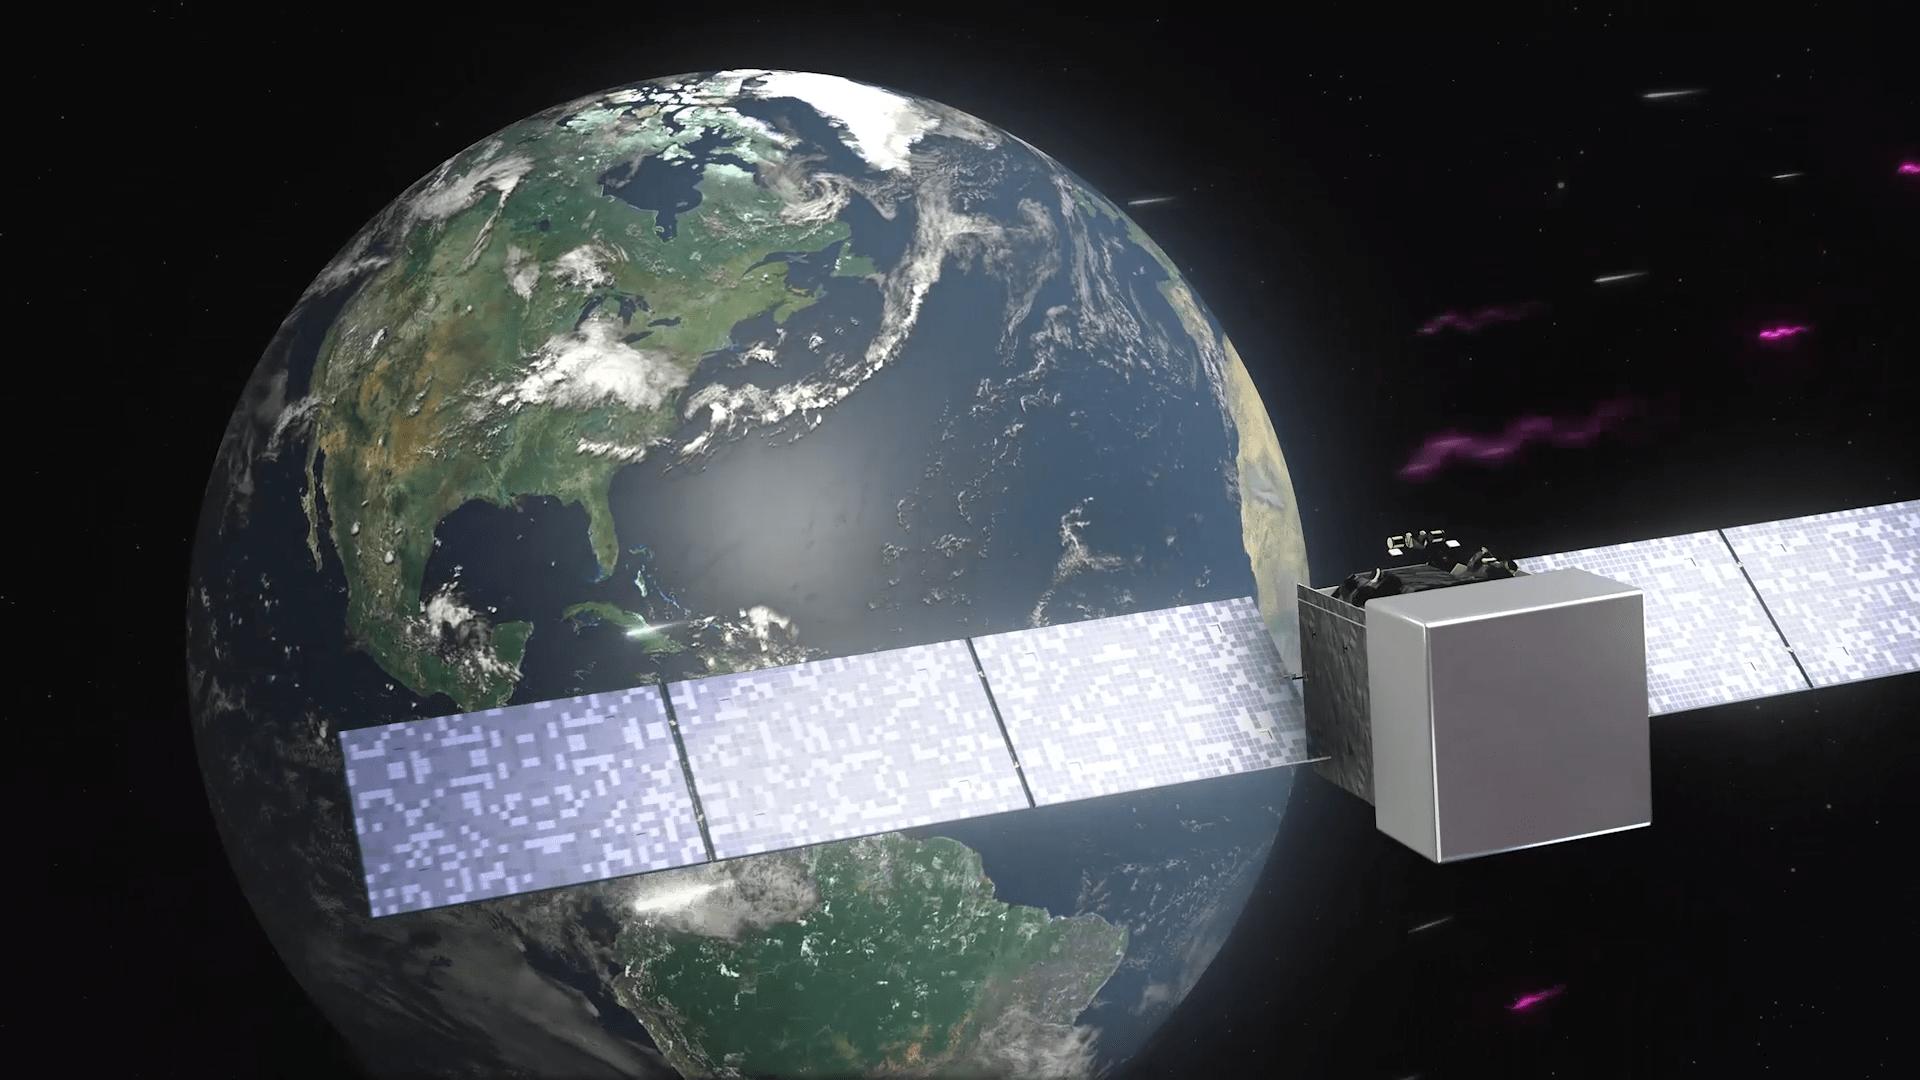 Animation: Fermi detects the blazar